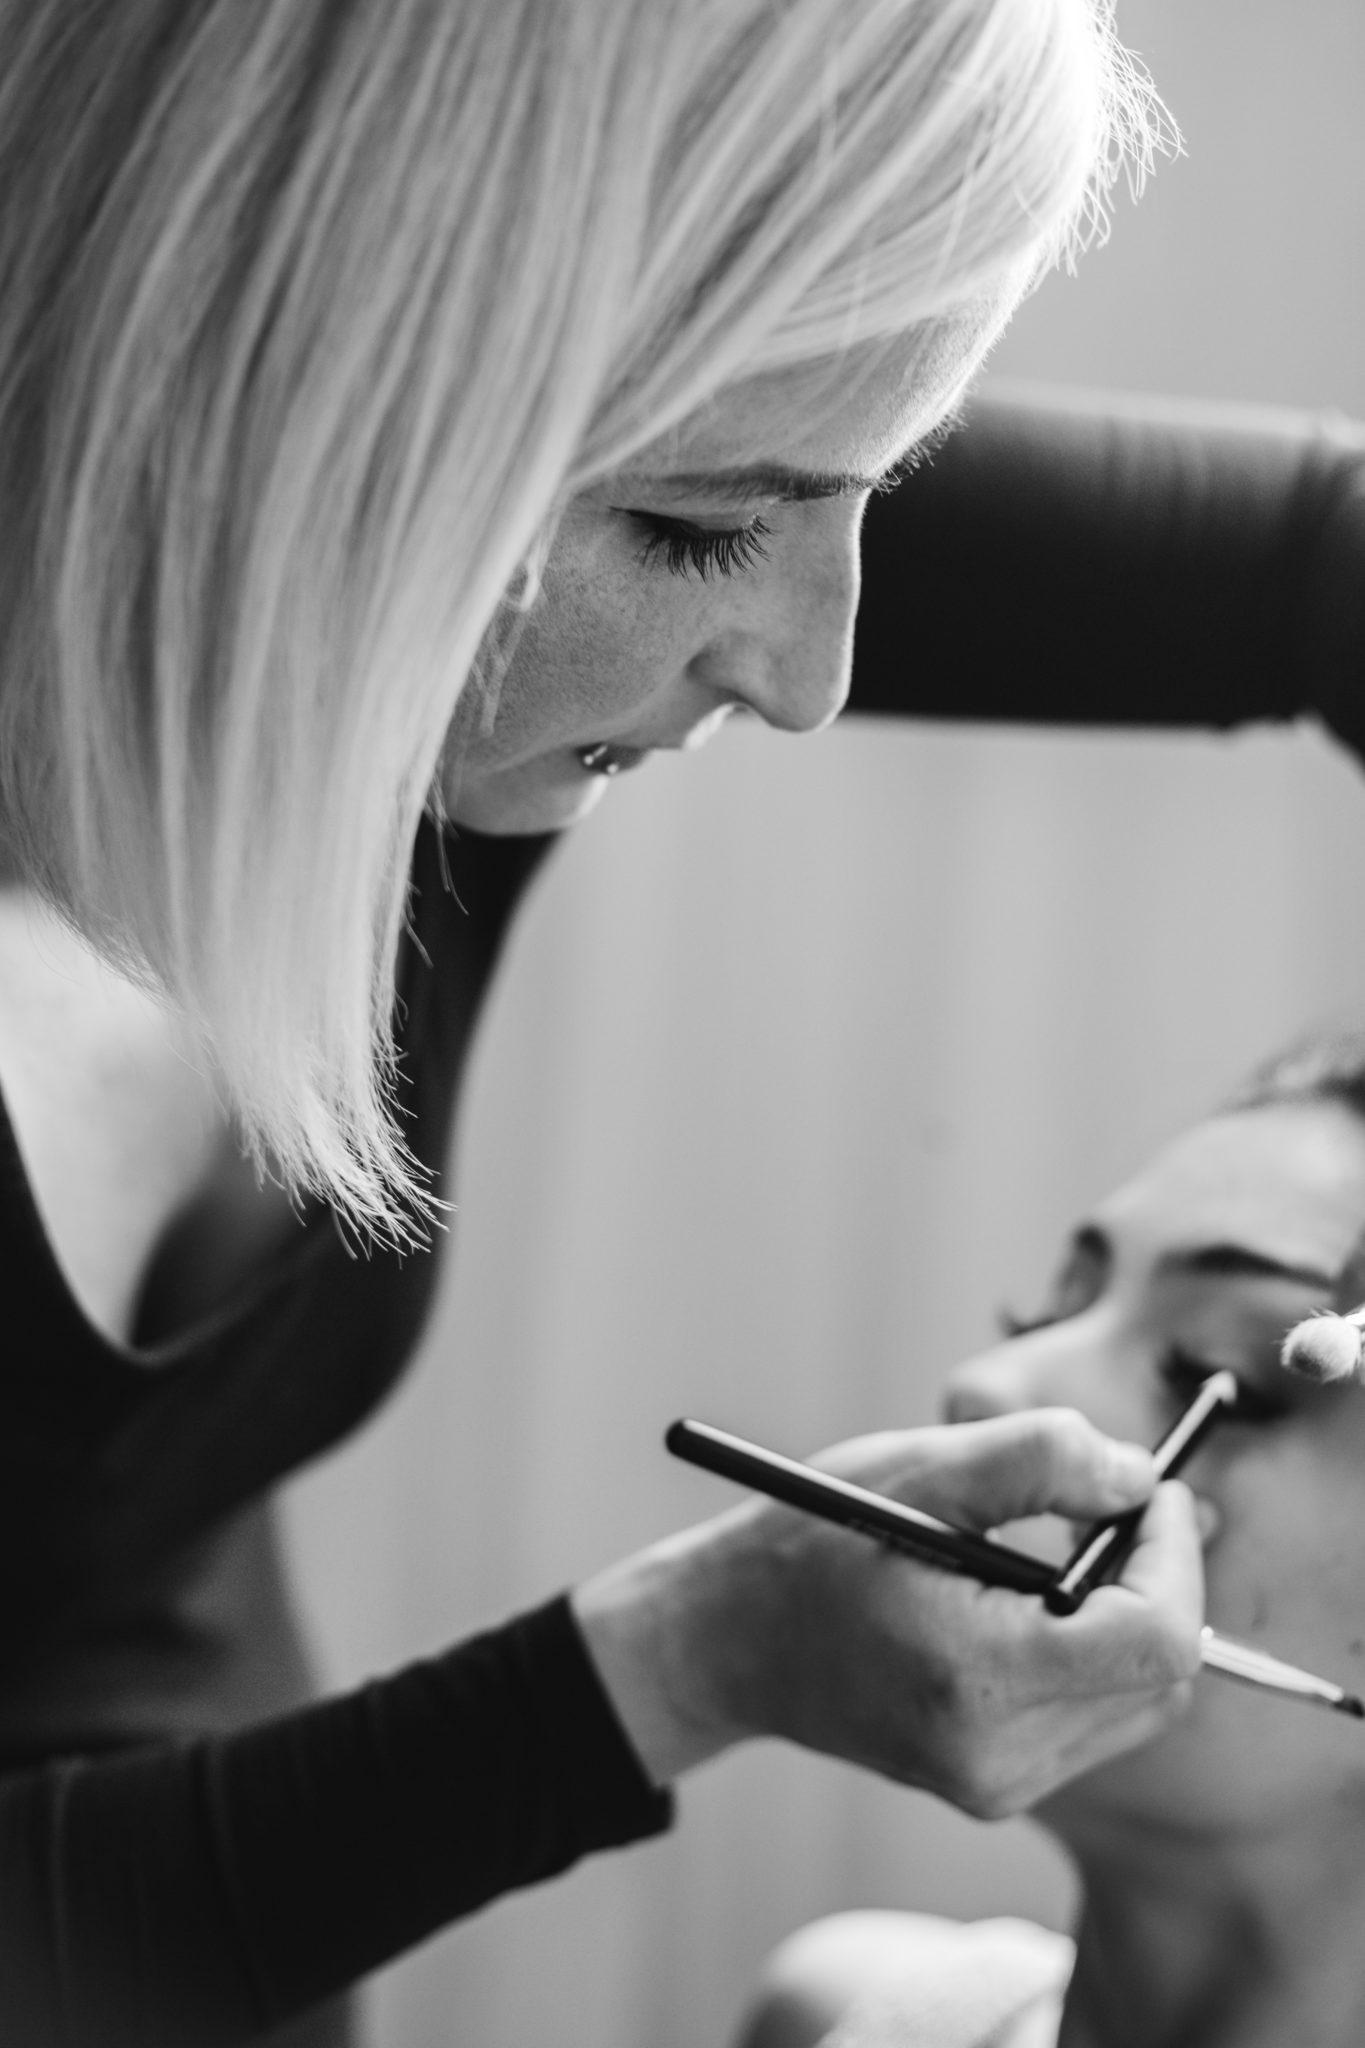 Maquillaje y peinado profesional para tu sesión de fotos, La Gallarda Fotografia Sesion Fotografica Retrato Boudoir Personal Branding Fotografo profesional Malaga Alhaurin de la Torre